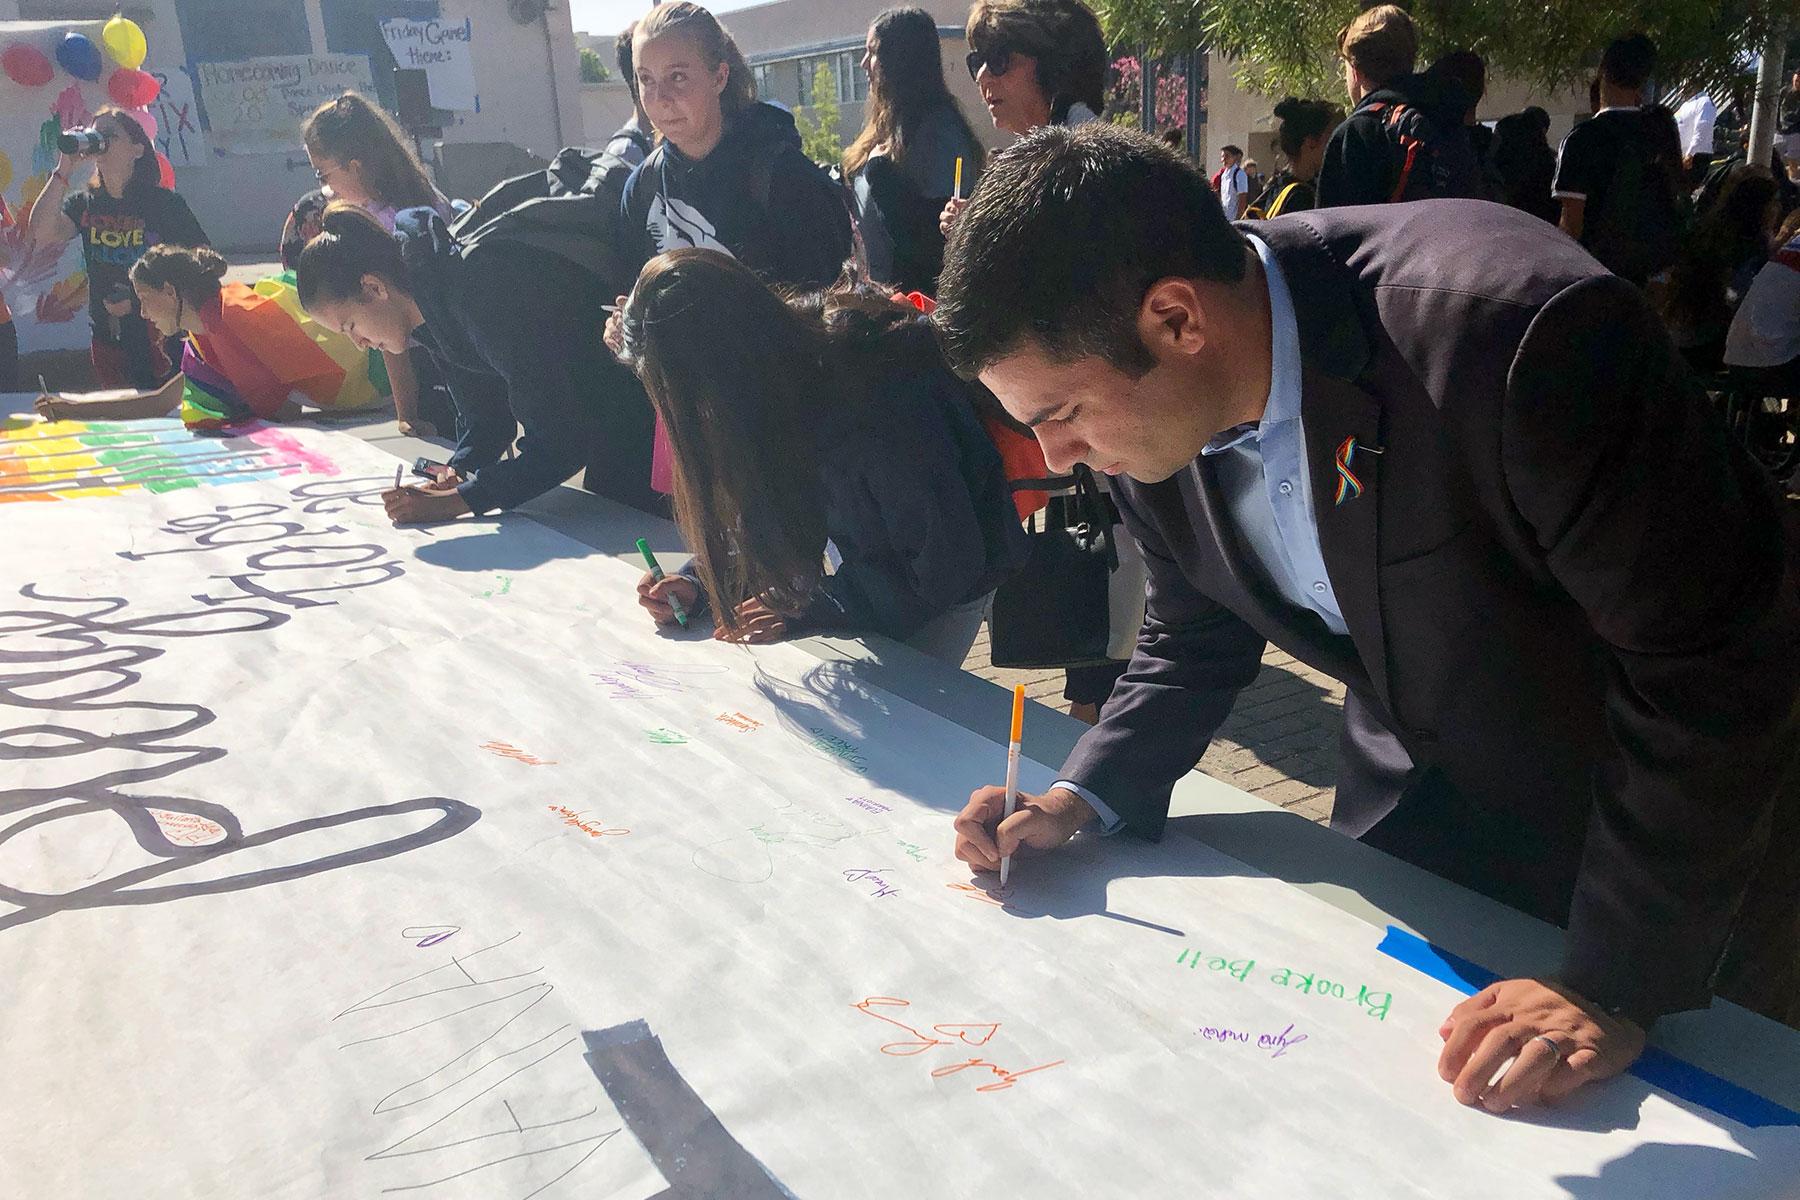 Crescenta Valley High School Ally Week September 2018